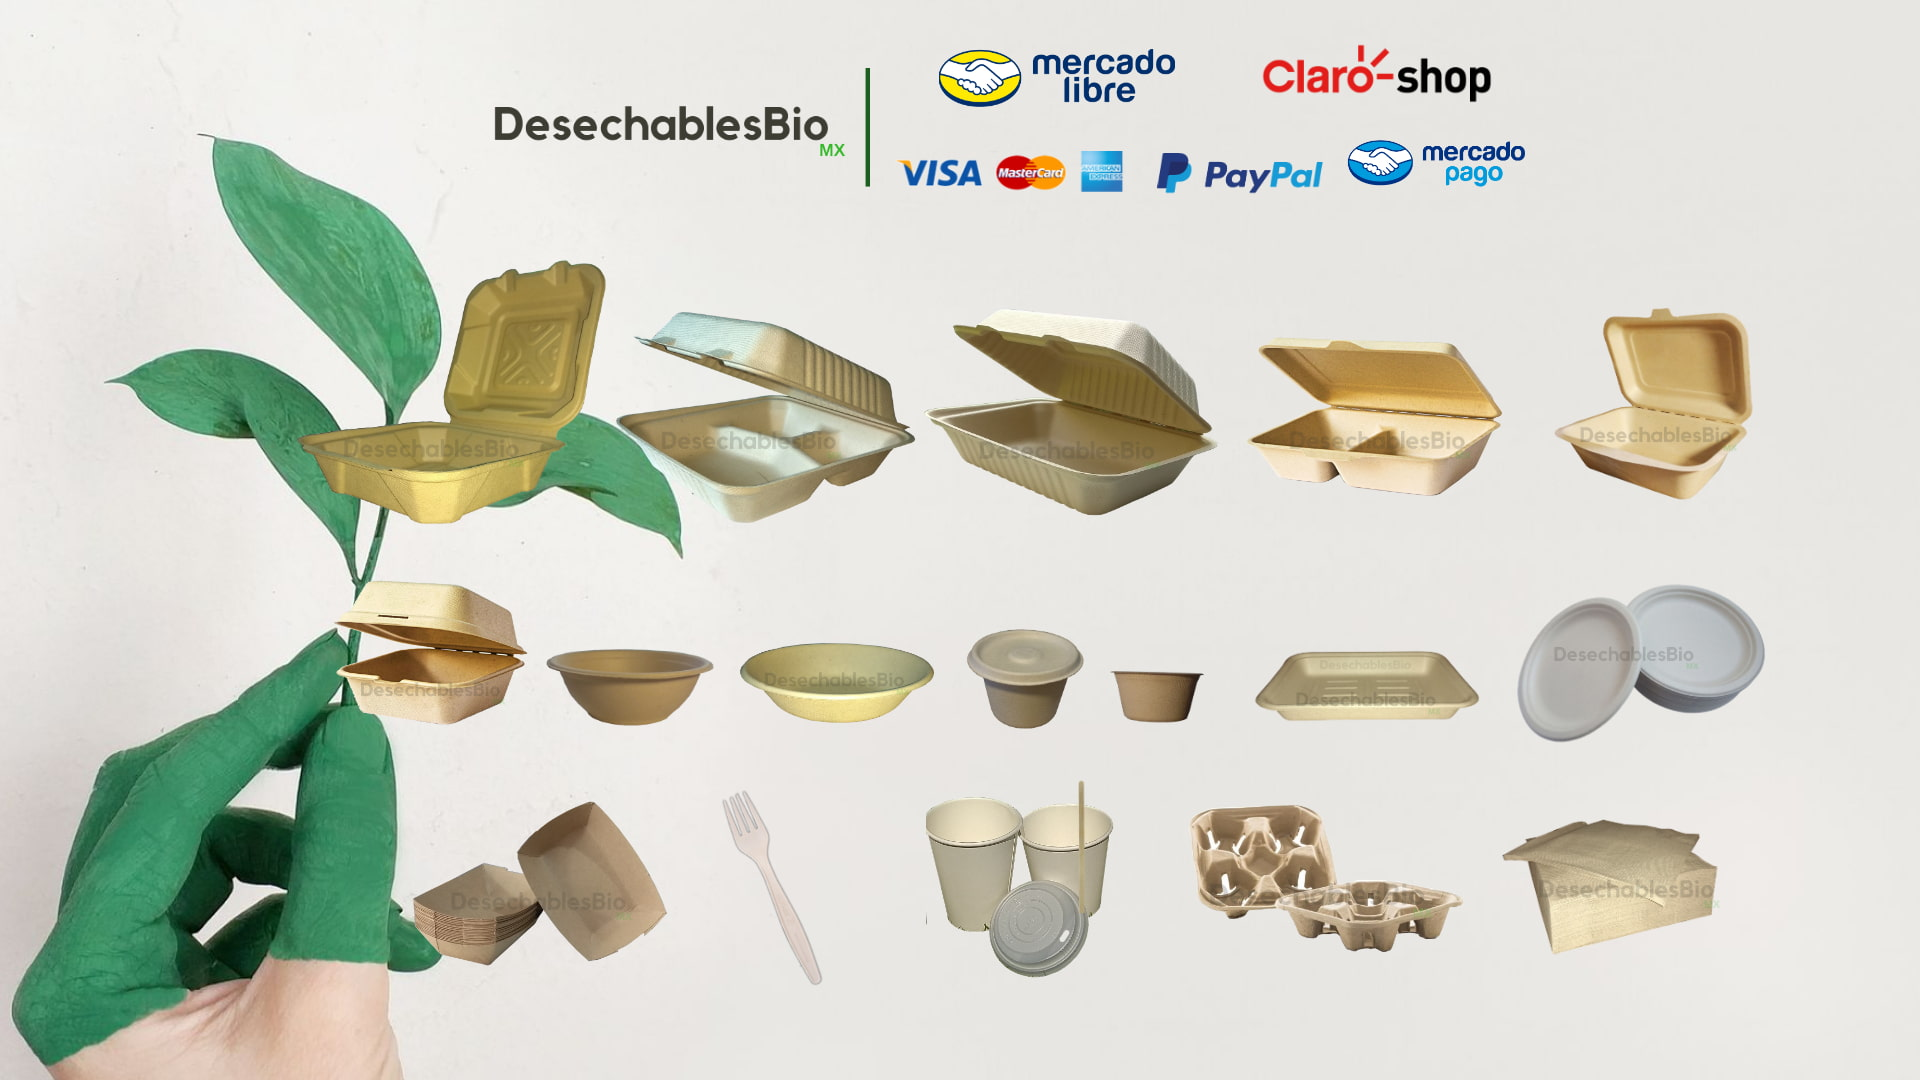 Desechables Bio México